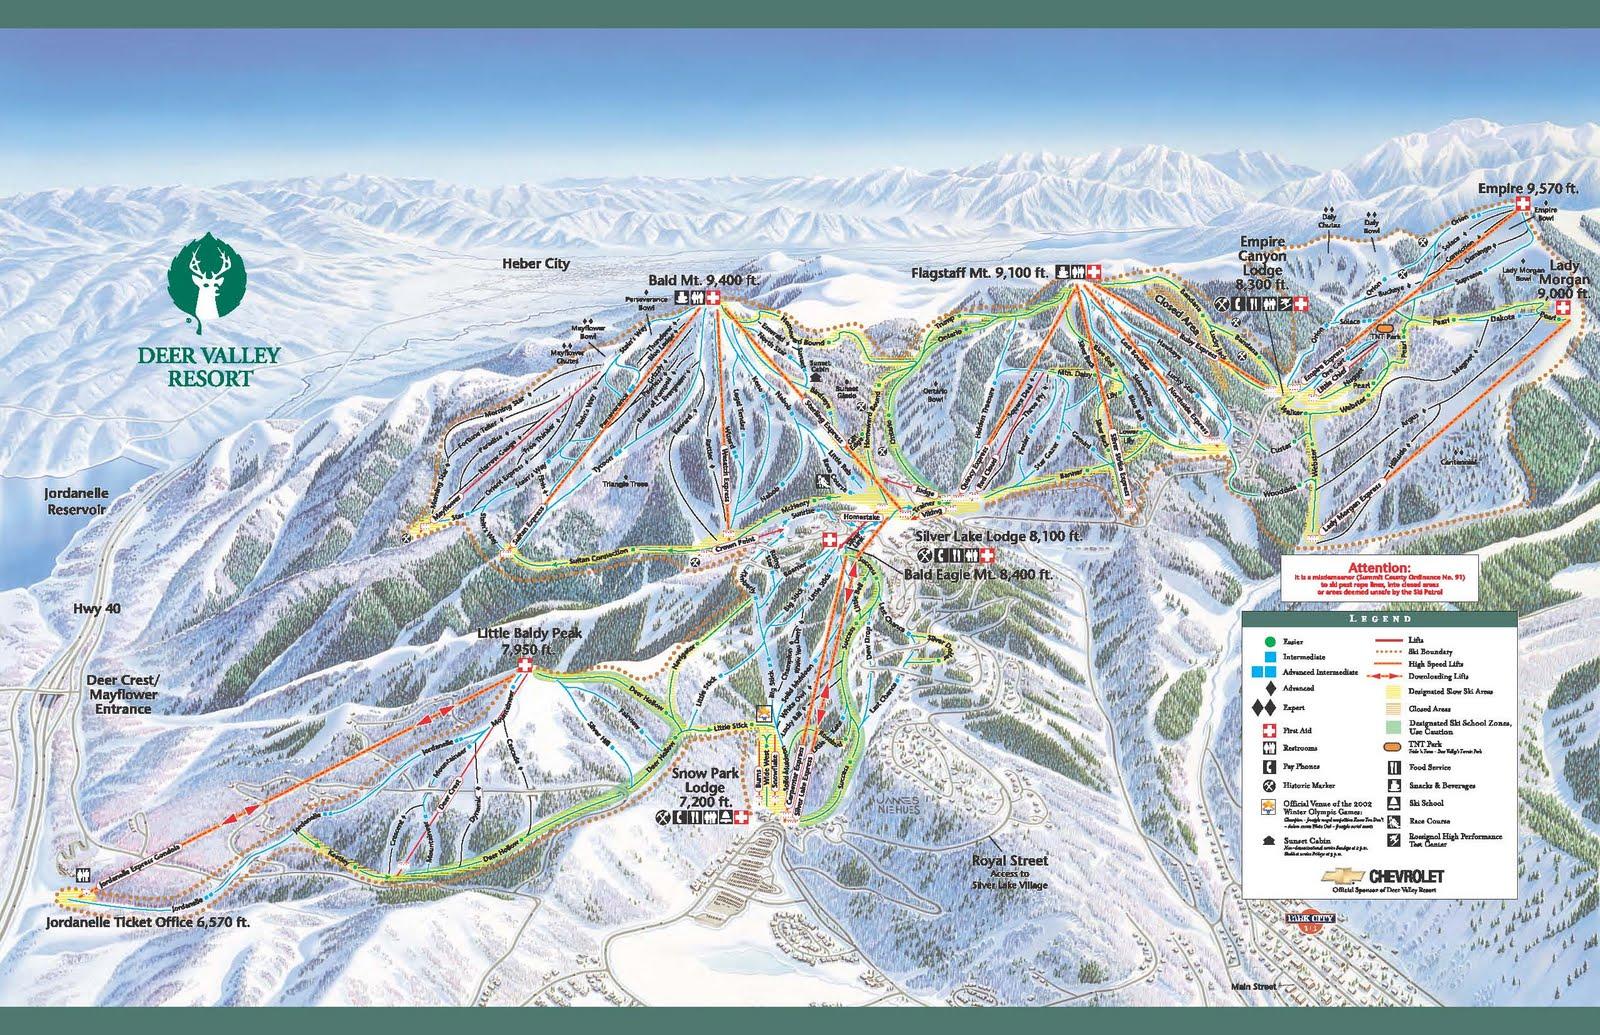 Ski Resort Reviews: Trail Maps on